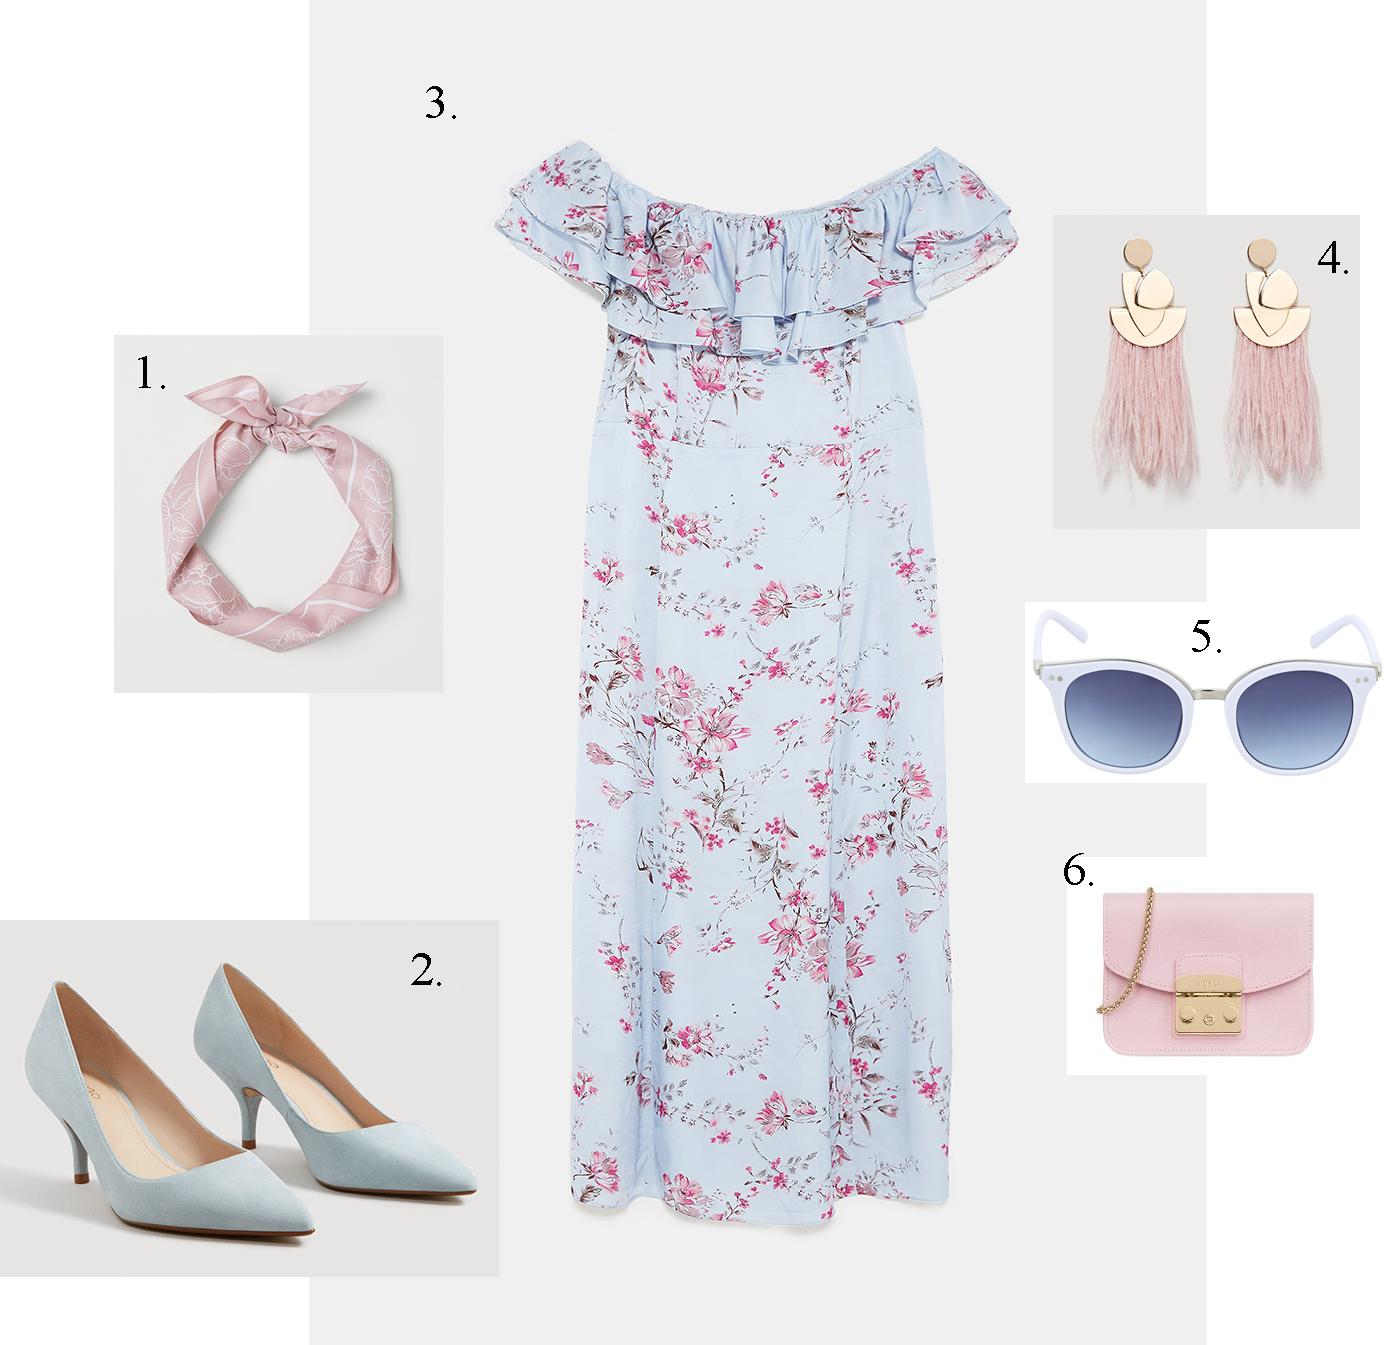 kek_rozsaszin_viragmintas_maxi_ruha_outfit.png